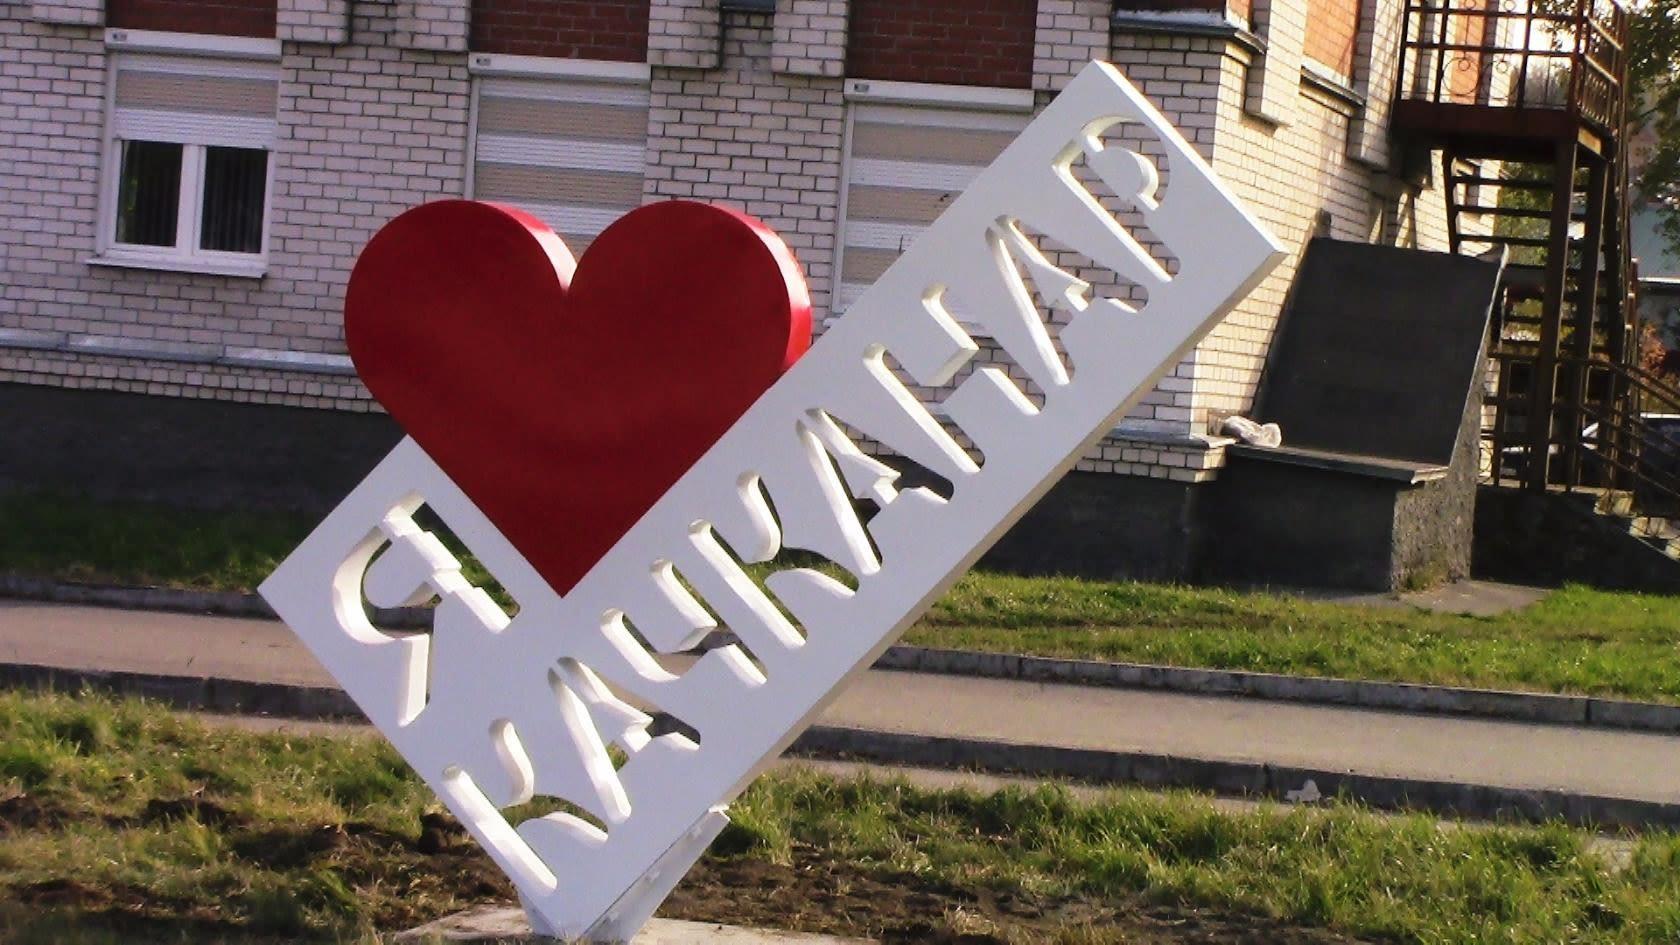 Арт-объект «Я люблю Качканар» в Качканаре. Фото: Кудрявцев В. А.